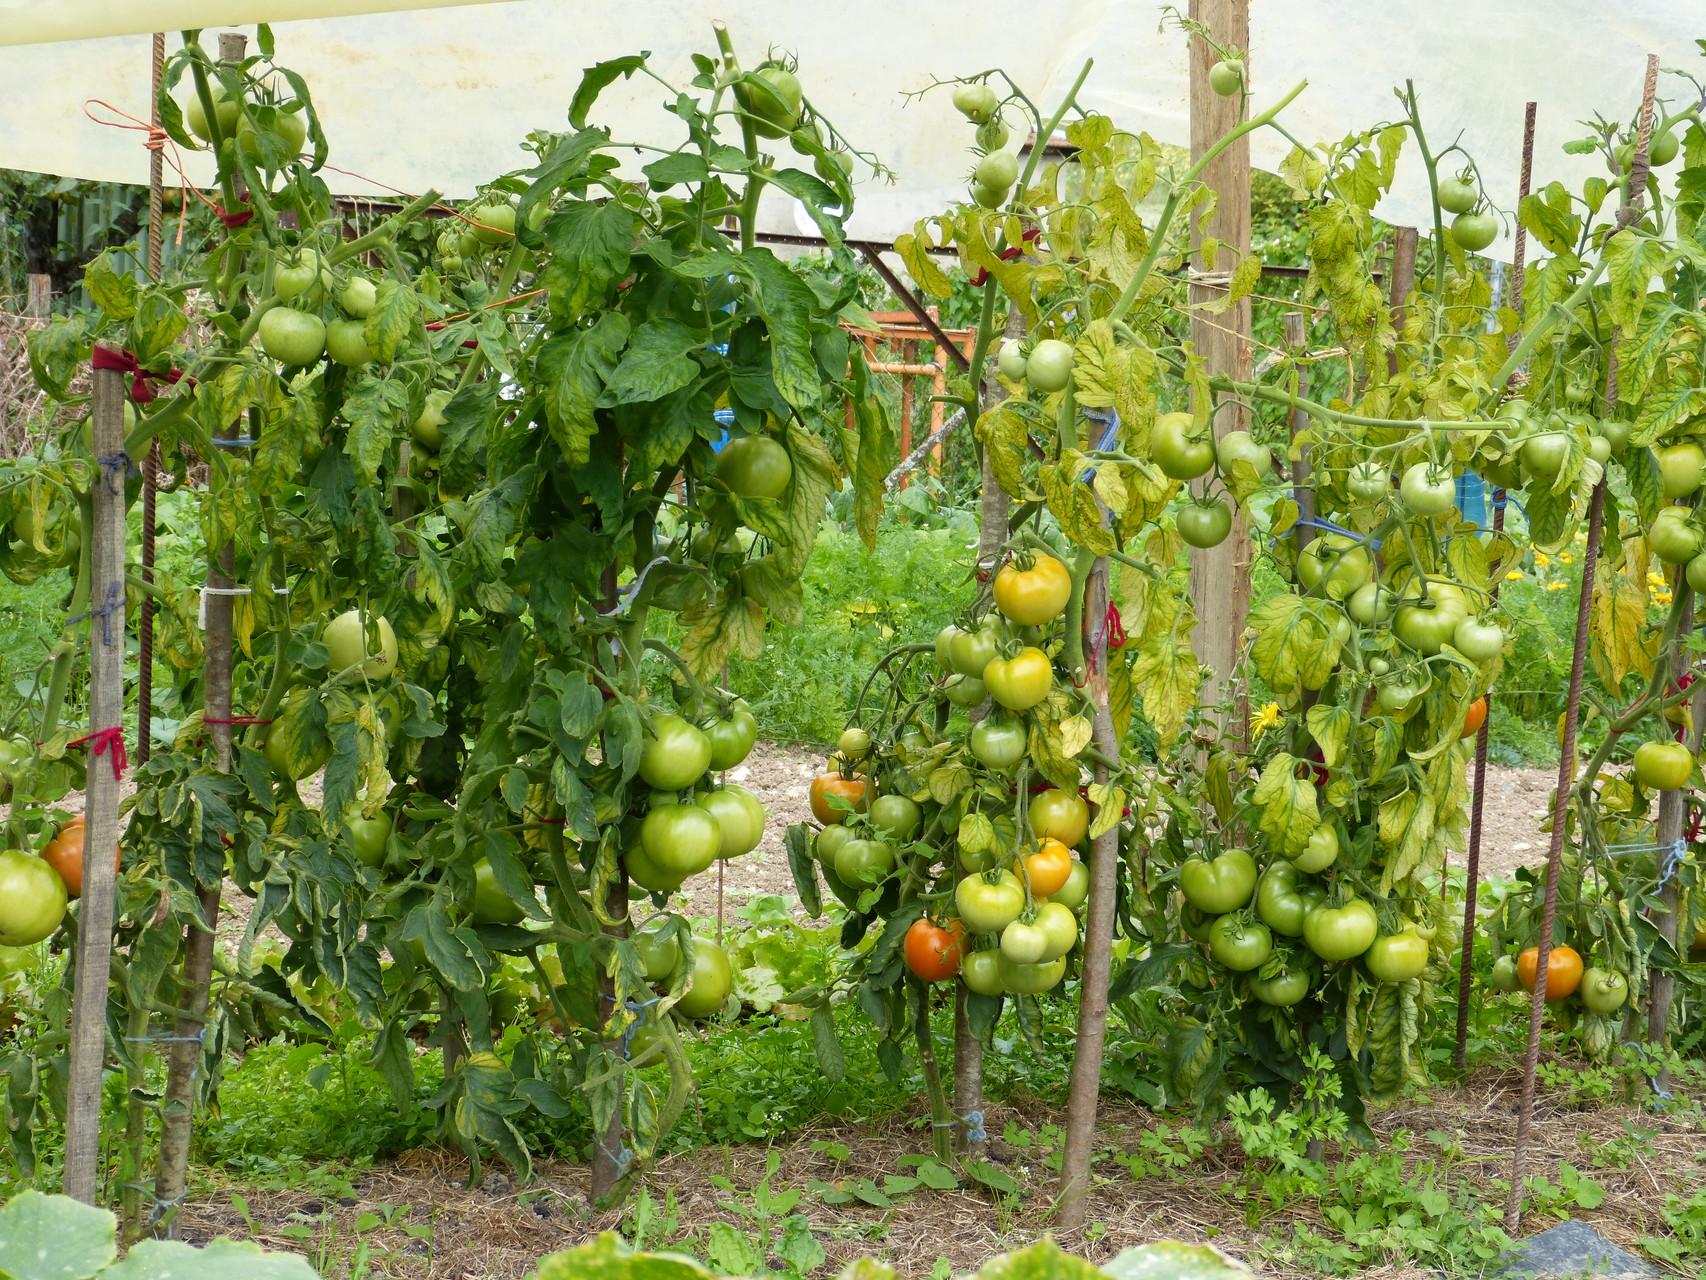 tomates qui mûrissent septembre 2015